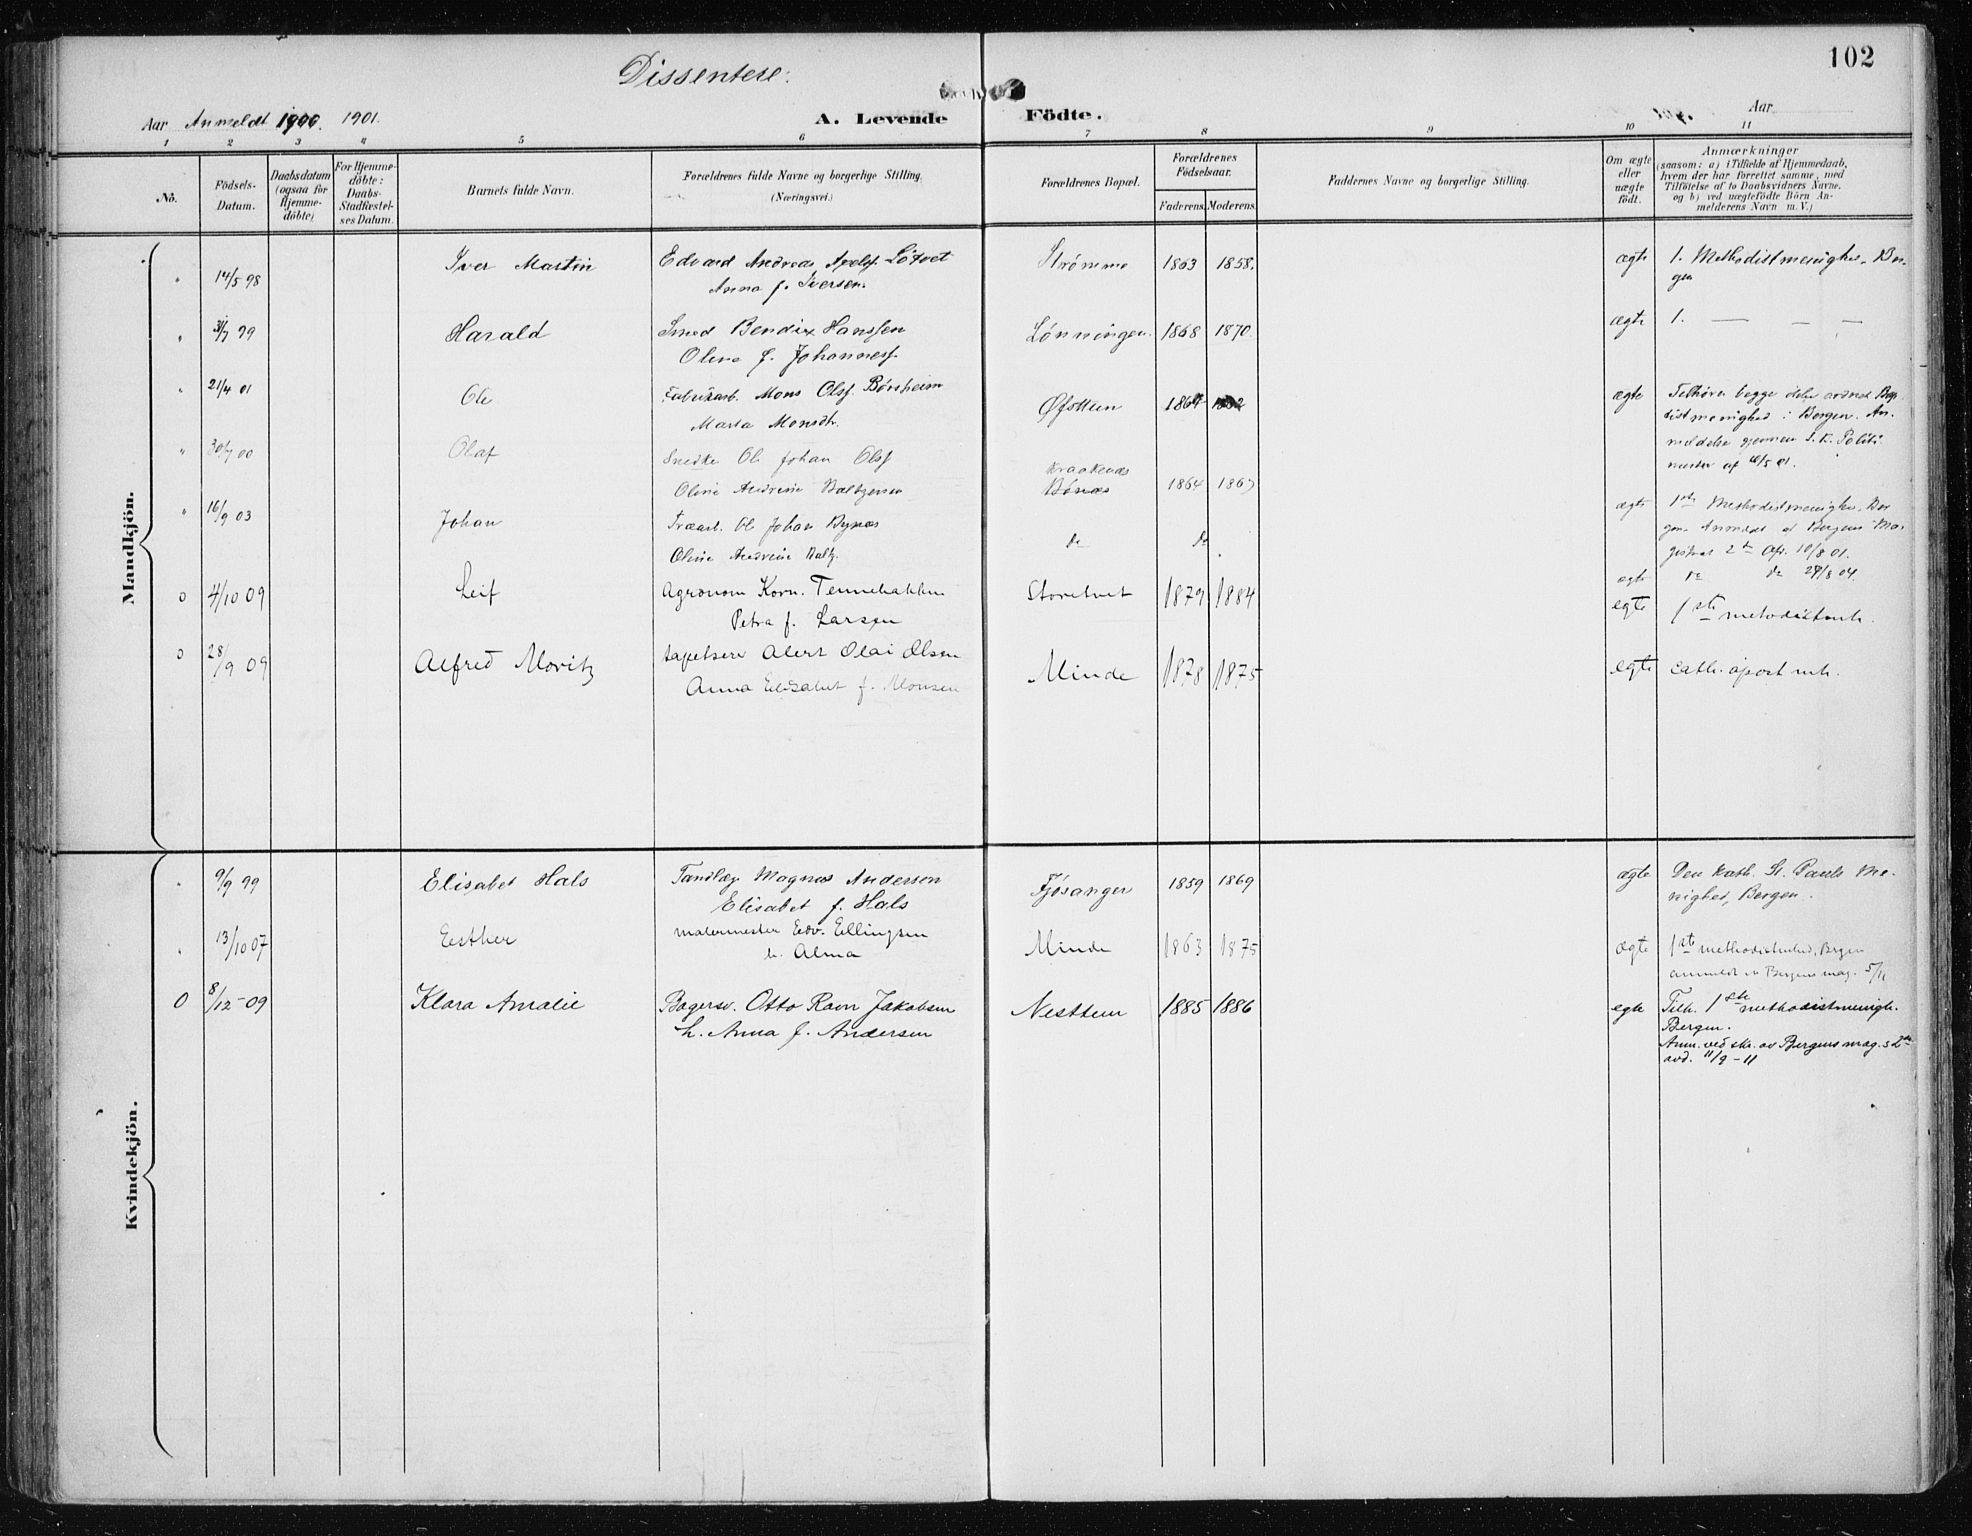 SAB, Fana Sokneprestembete, H/Haa/Haai/L0003: Ministerialbok nr. I 3, 1900-1912, s. 102